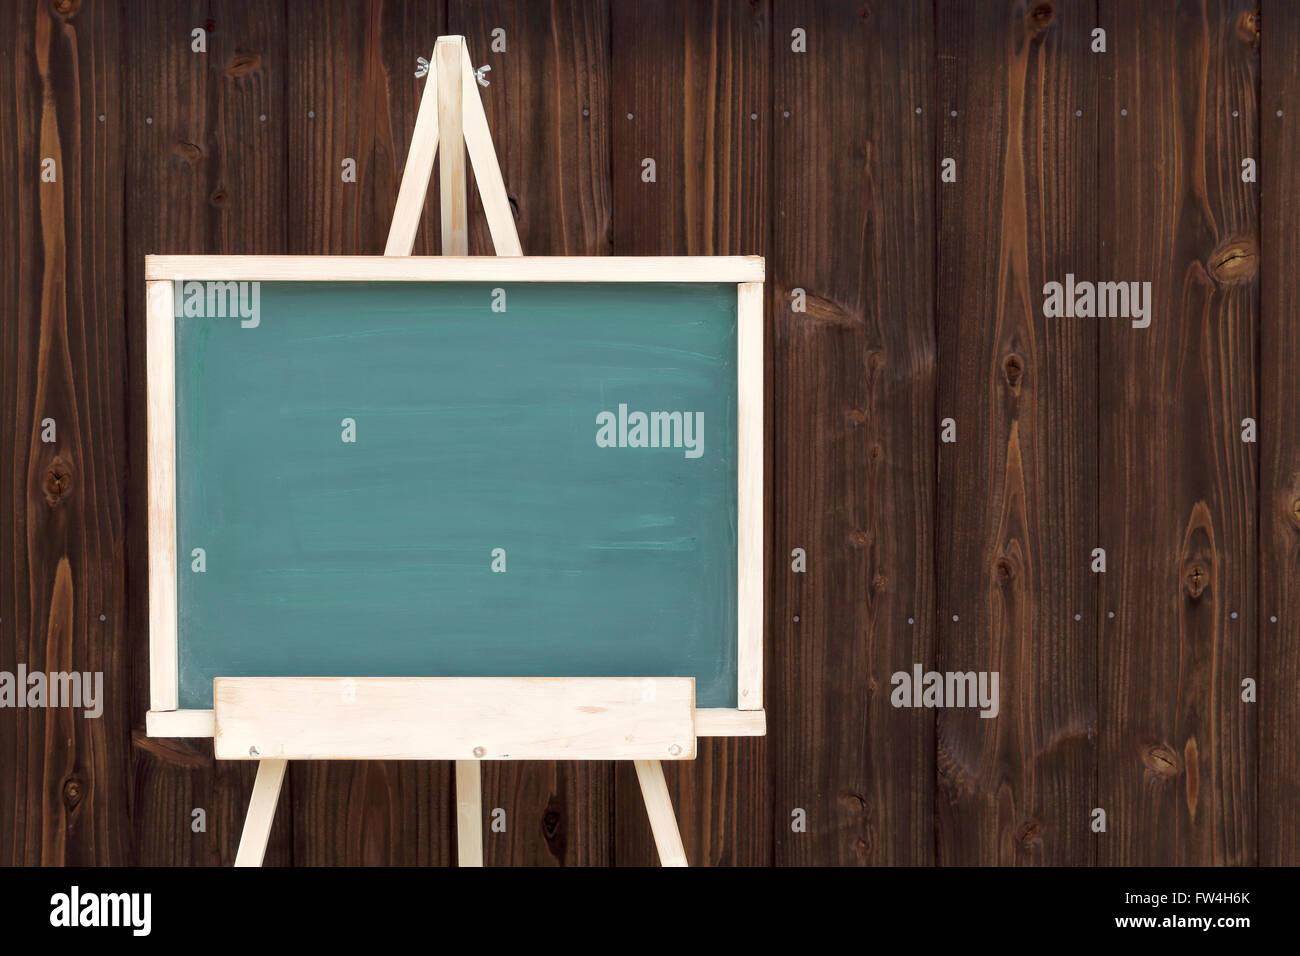 Chalkboard Easel Stock Photos & Chalkboard Easel Stock Images - Alamy